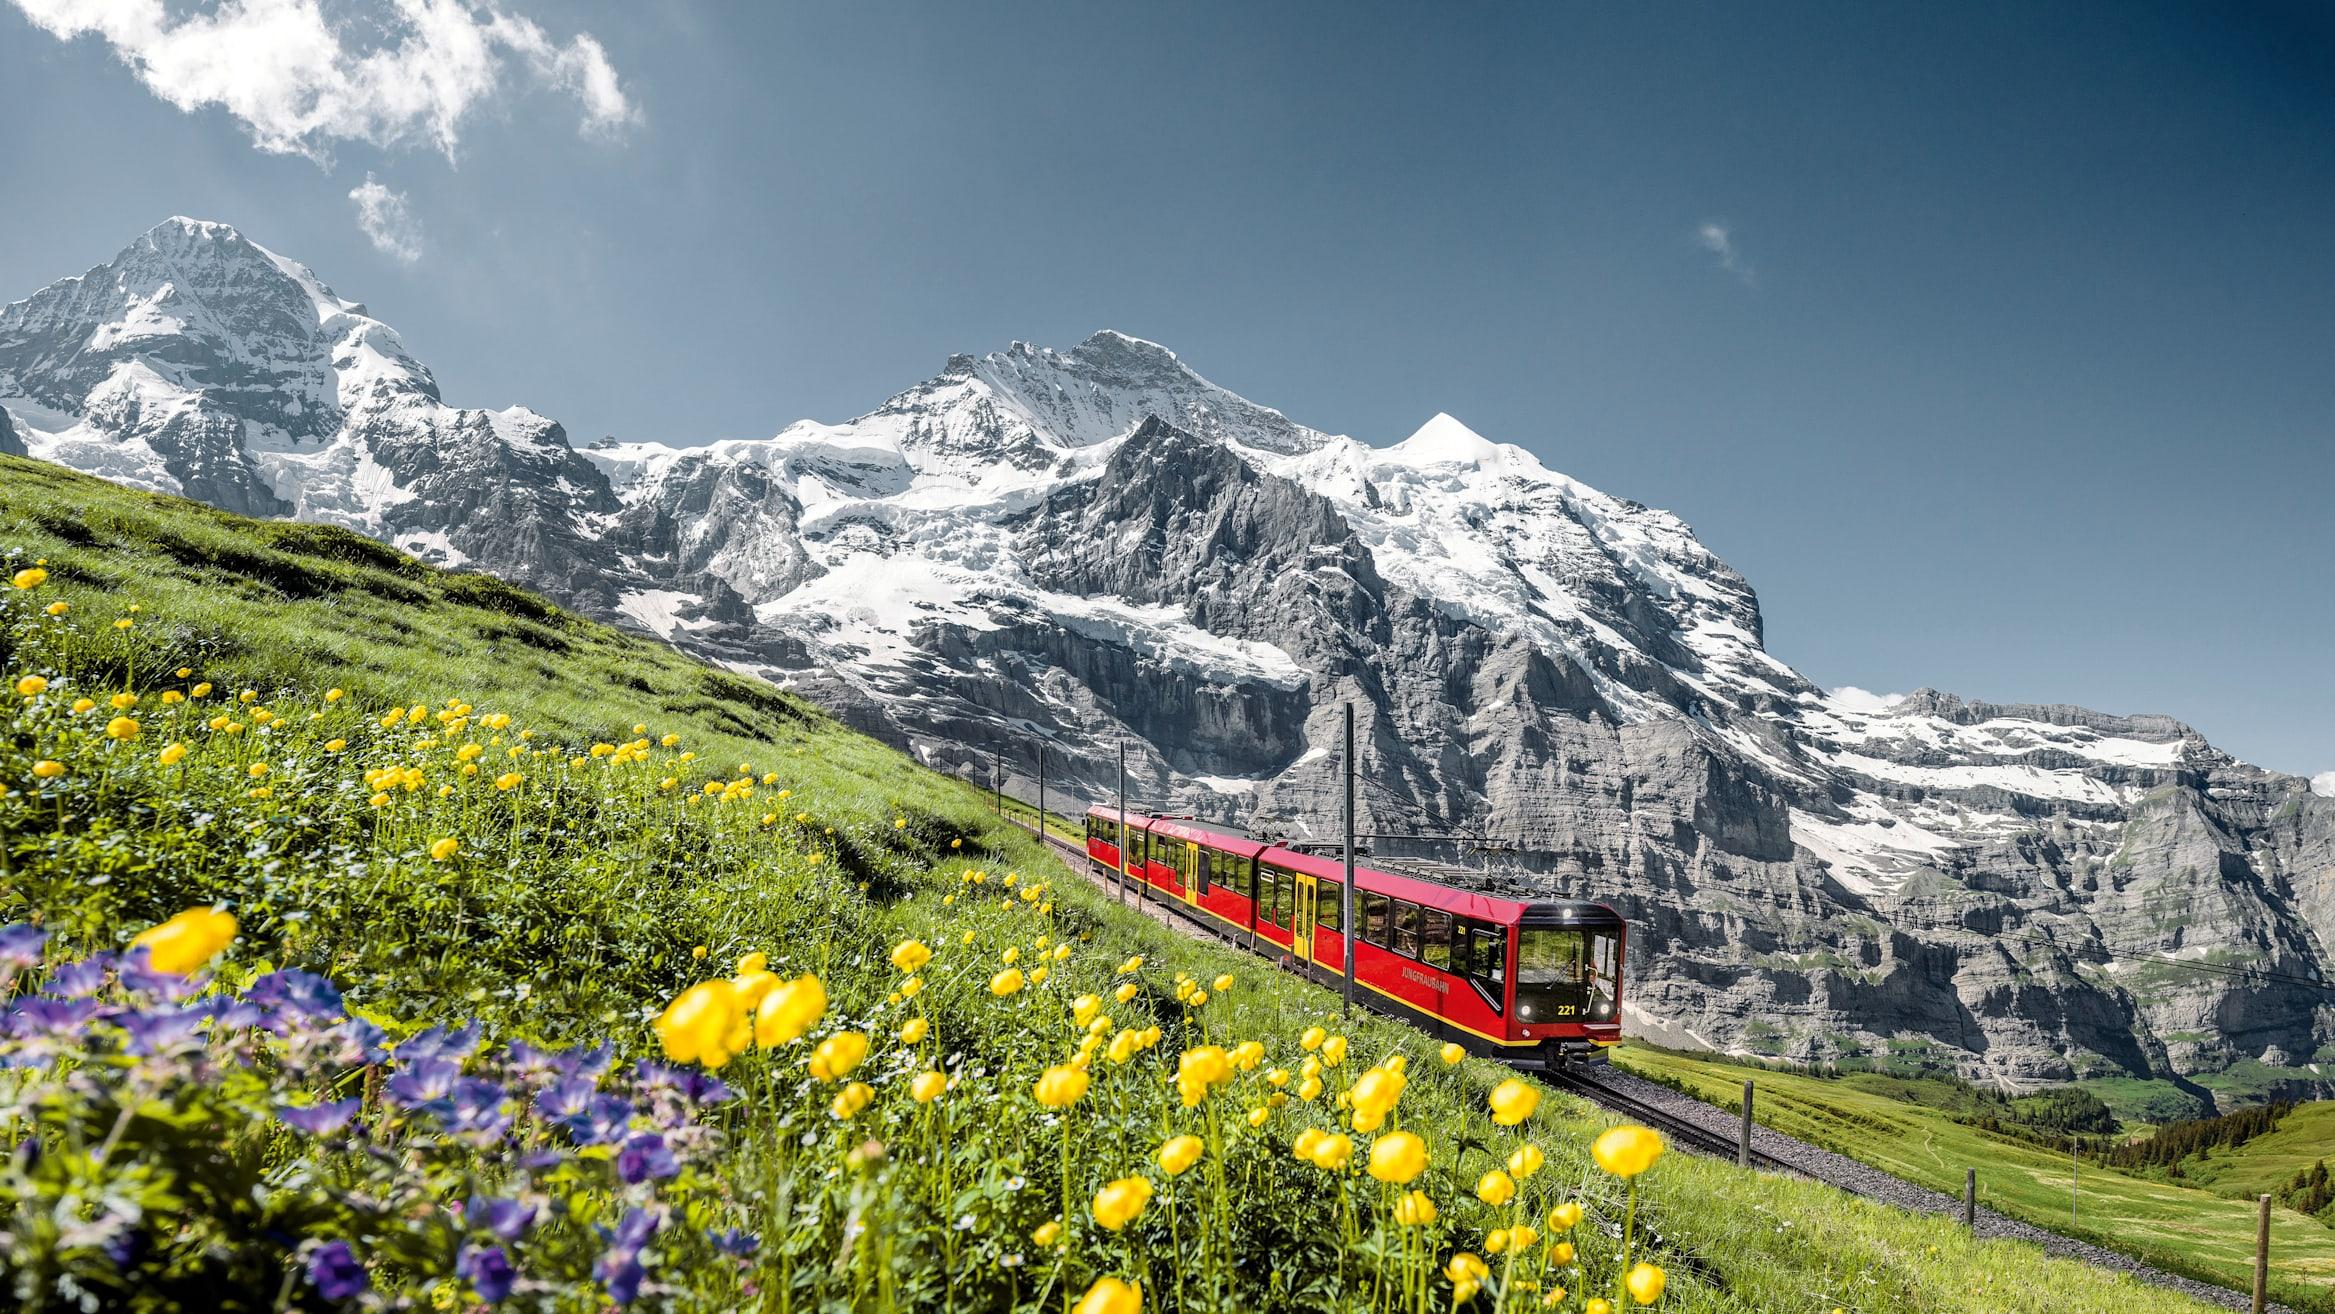 Jungfrau Railway moench jungfrau été 03